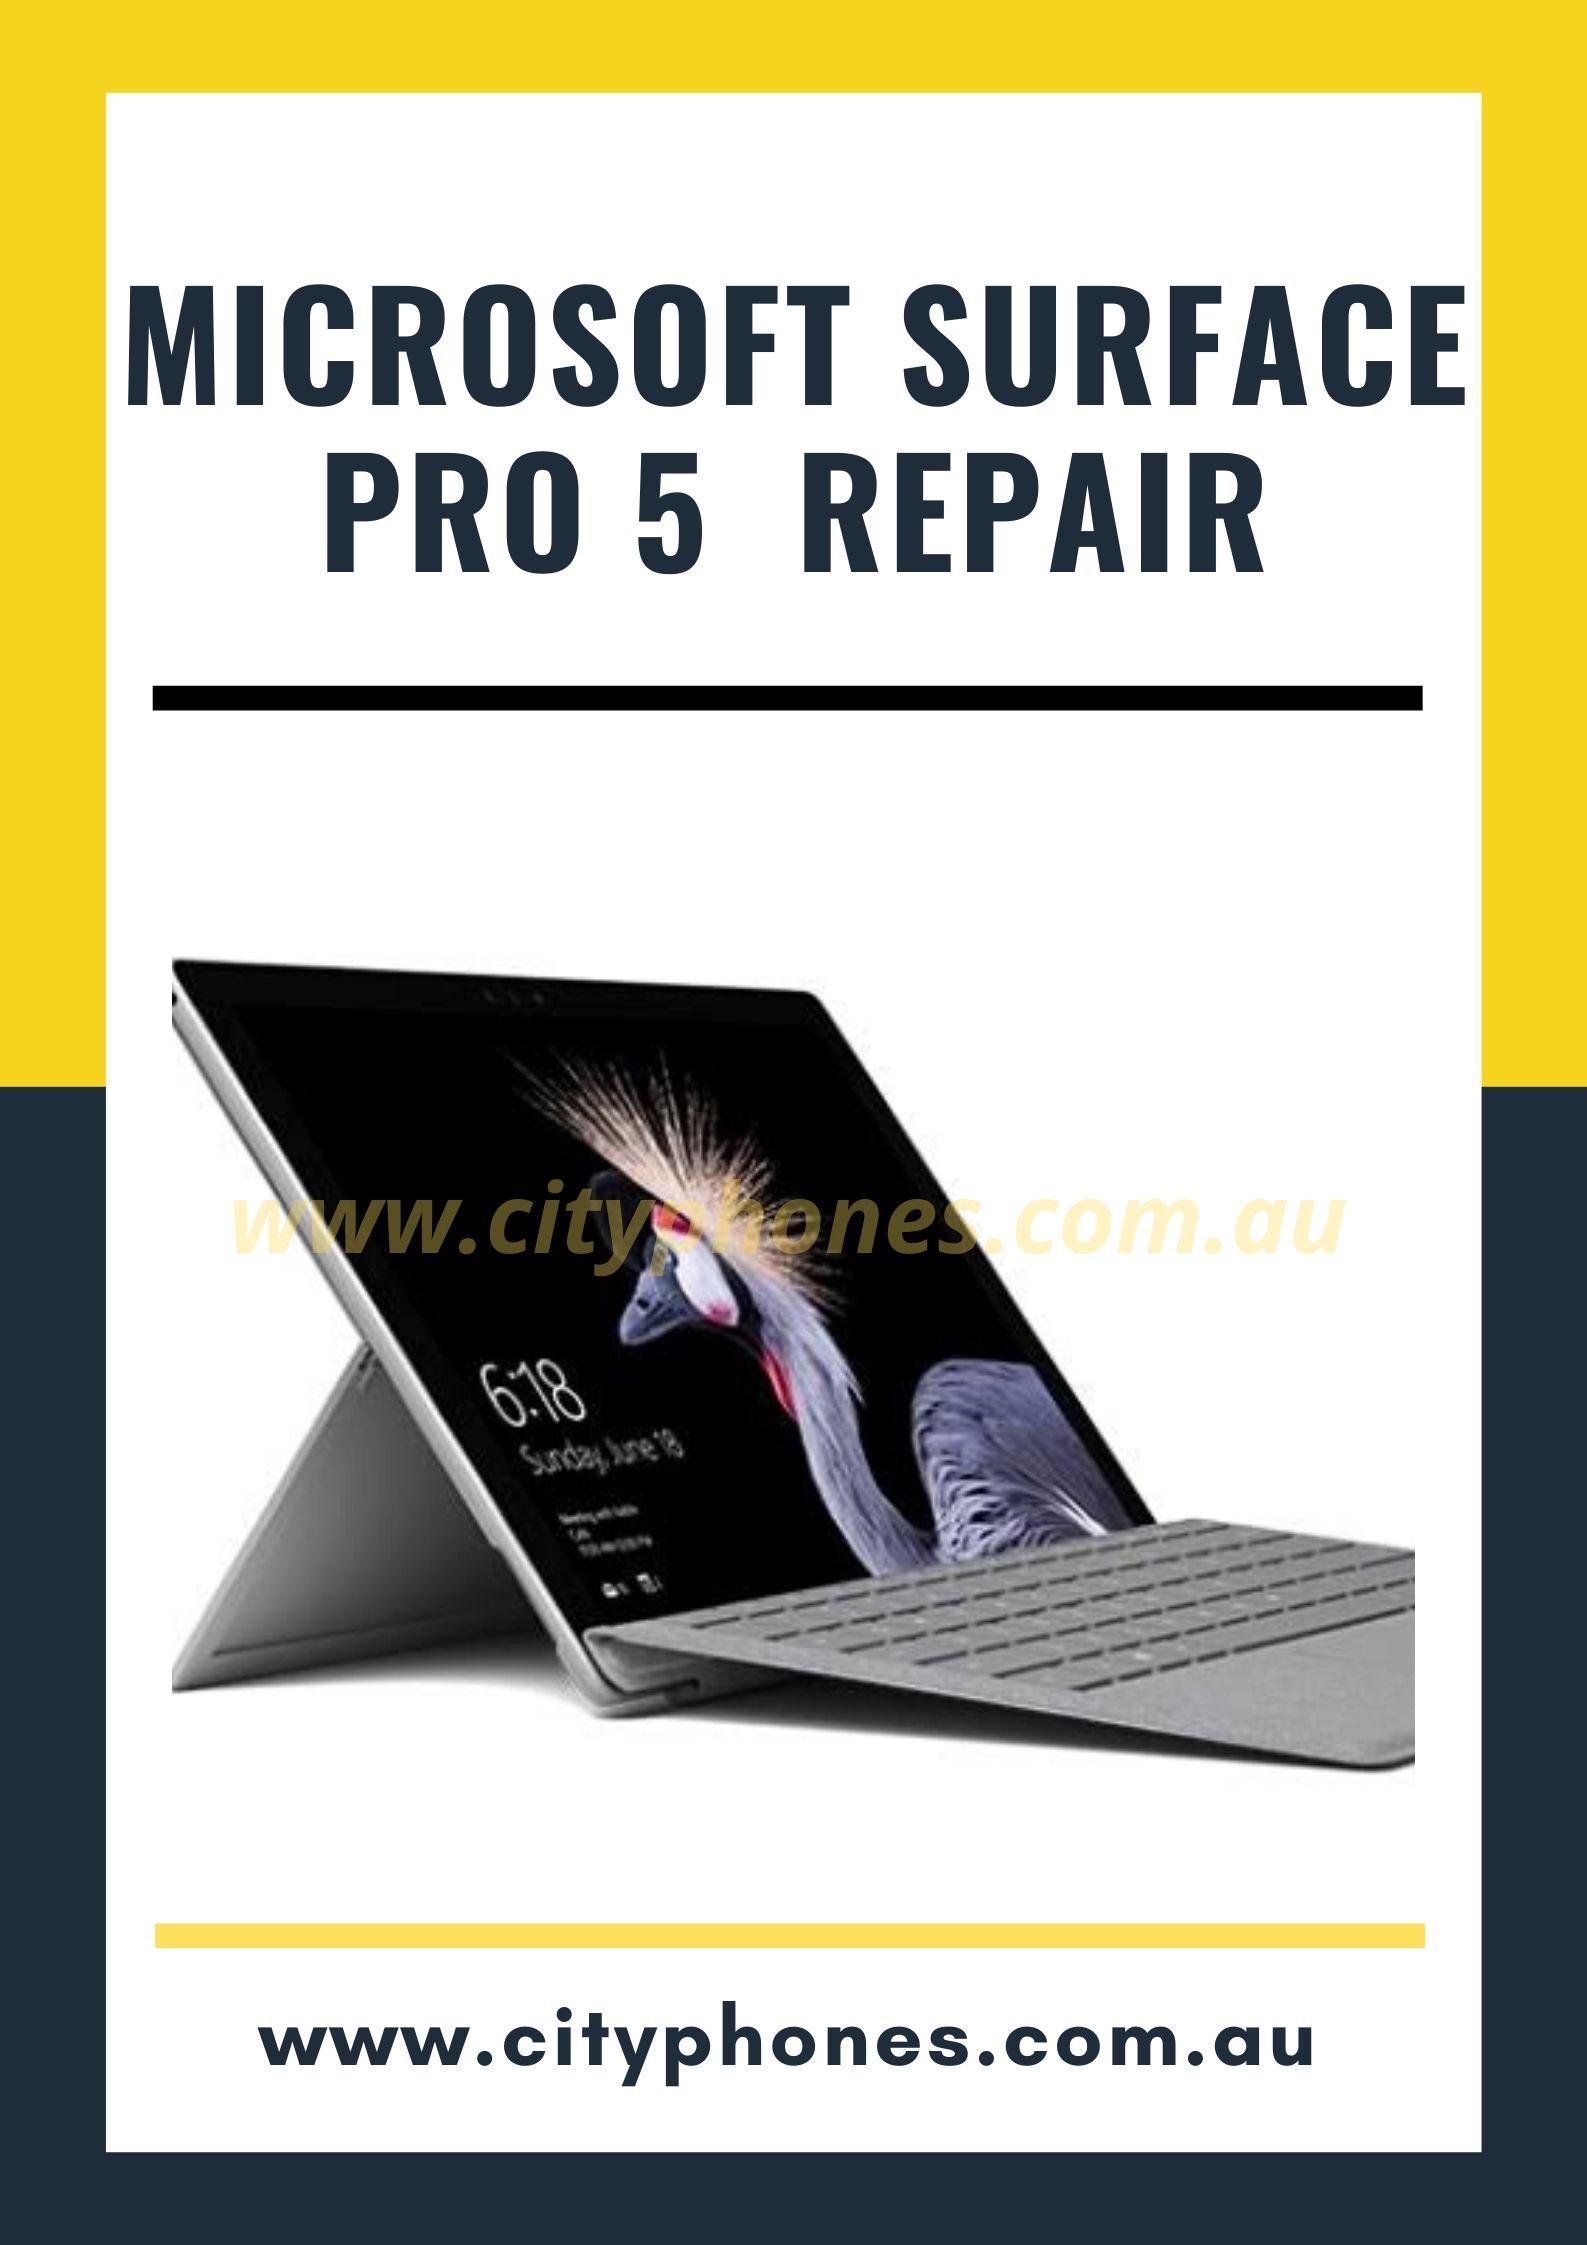 microsoft surface pro 5 screen repair in melbourne